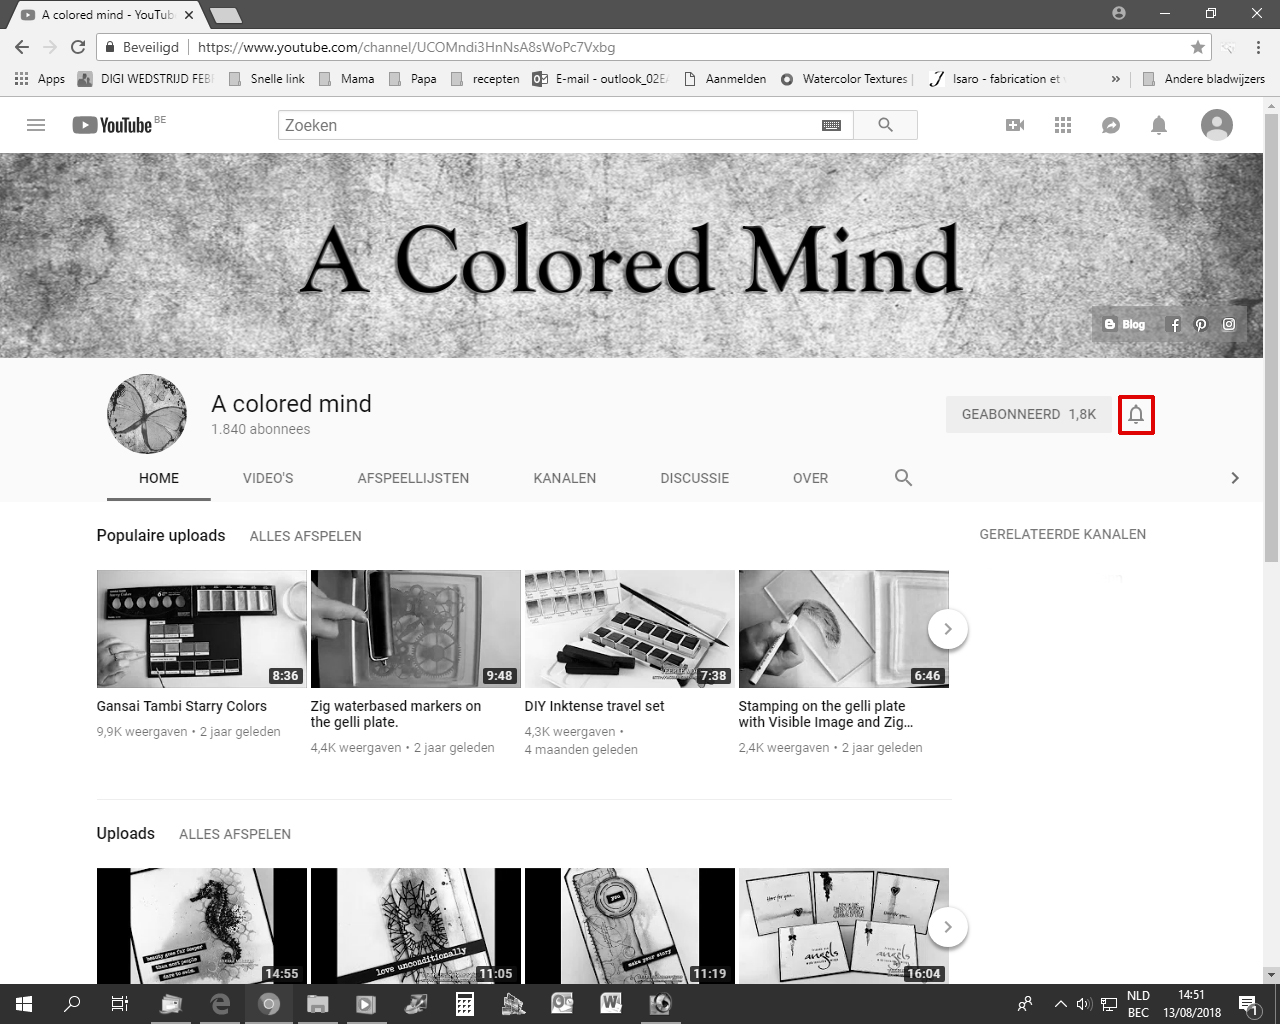 A colored mind